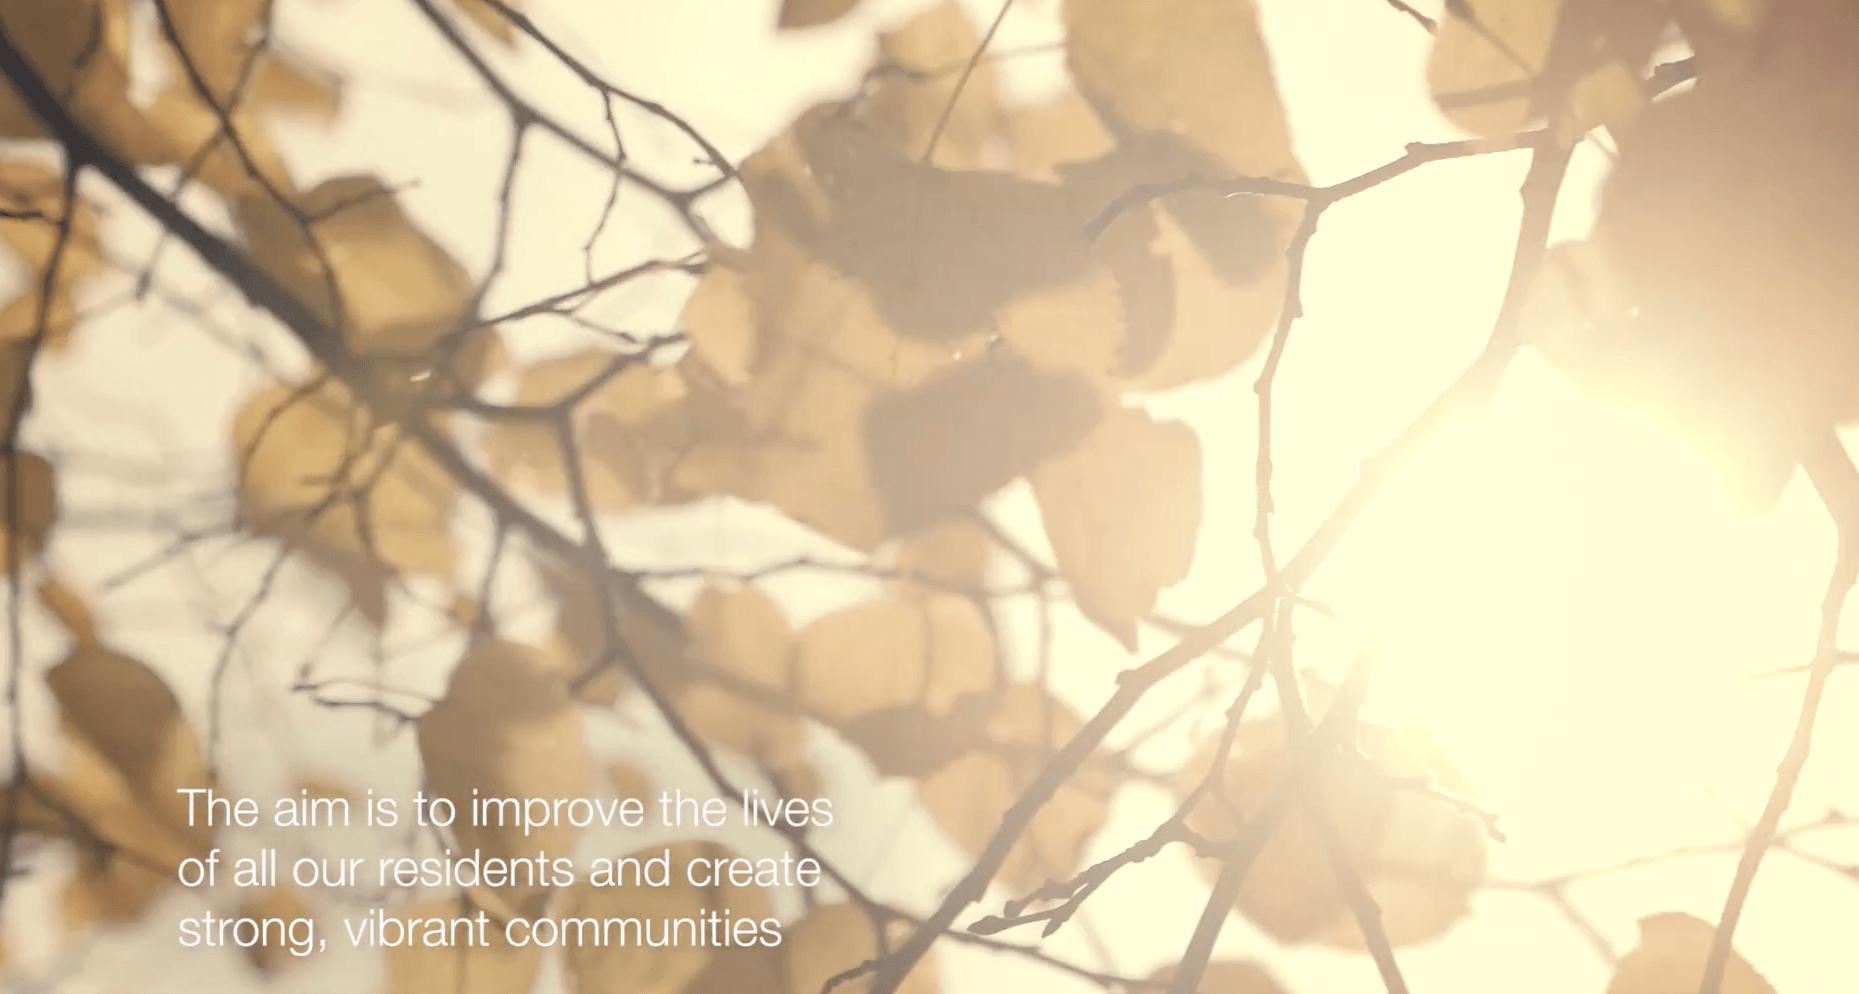 Waltham Forest Health & Wellbeing Strategy 2016